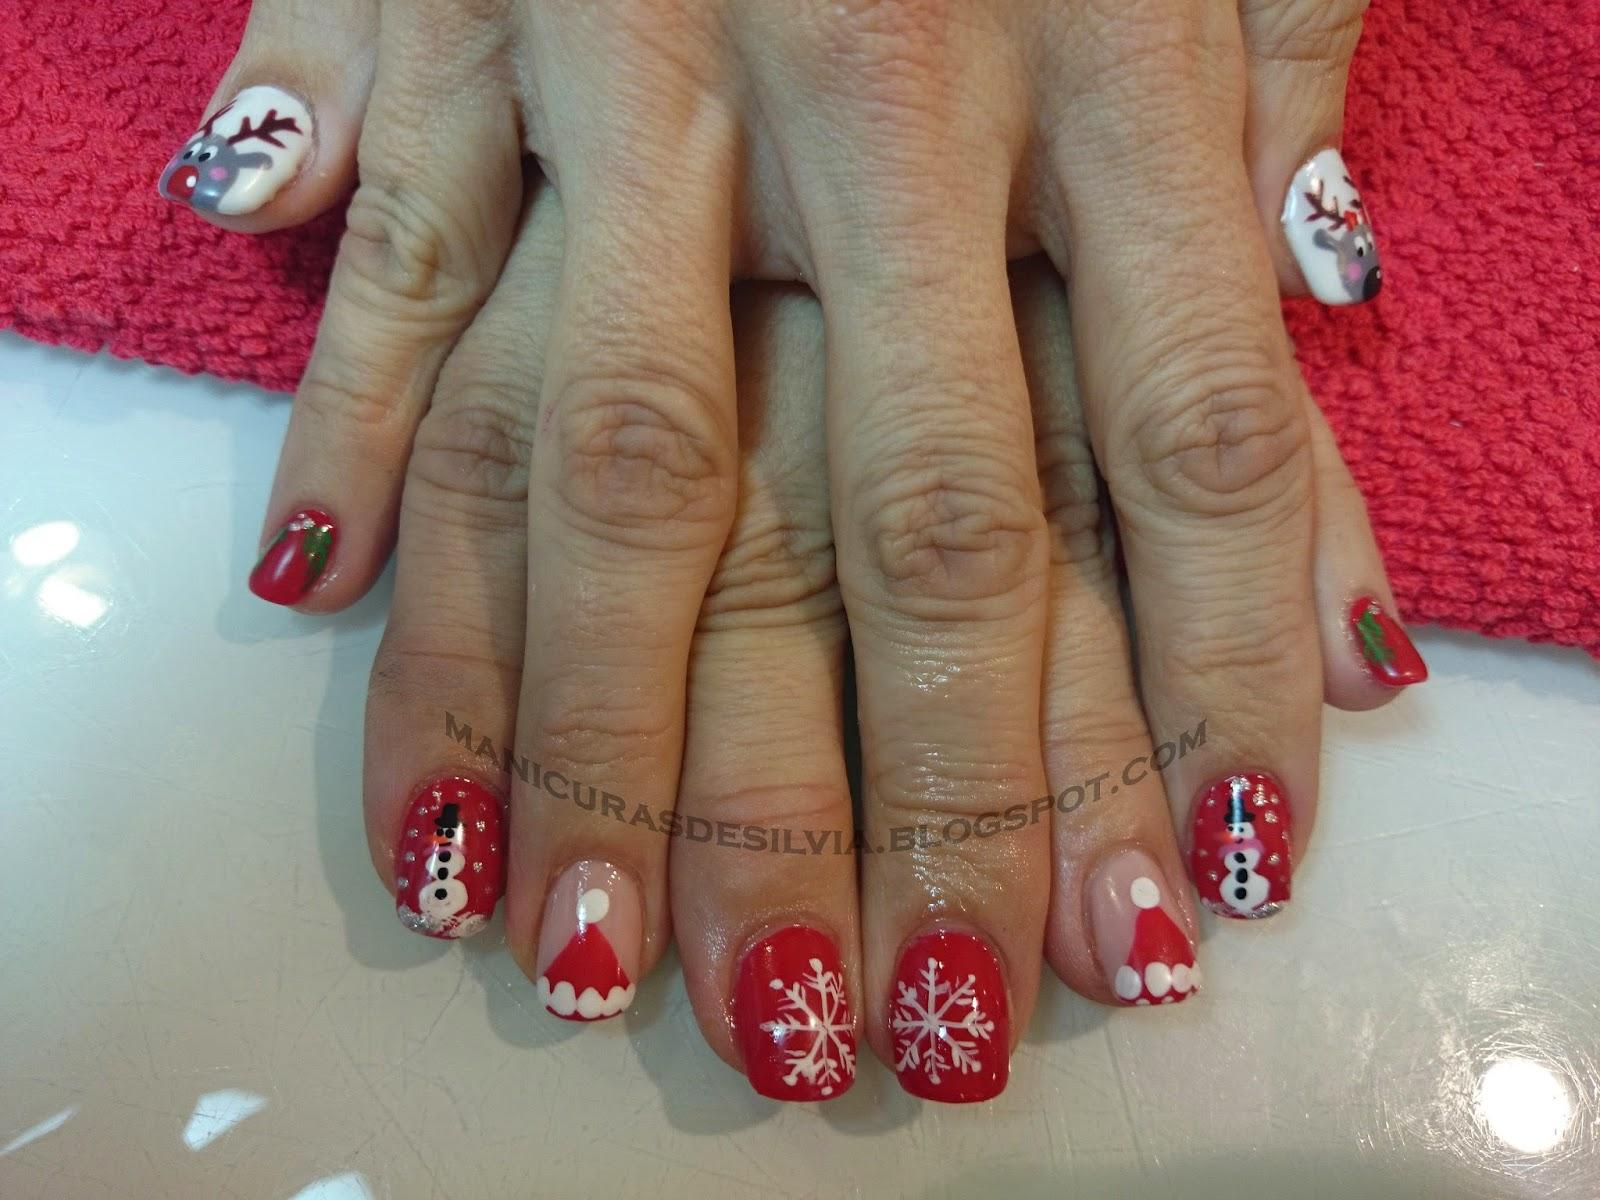 Manicuras de Silvia: Mix navideño (Christmas mix nails)